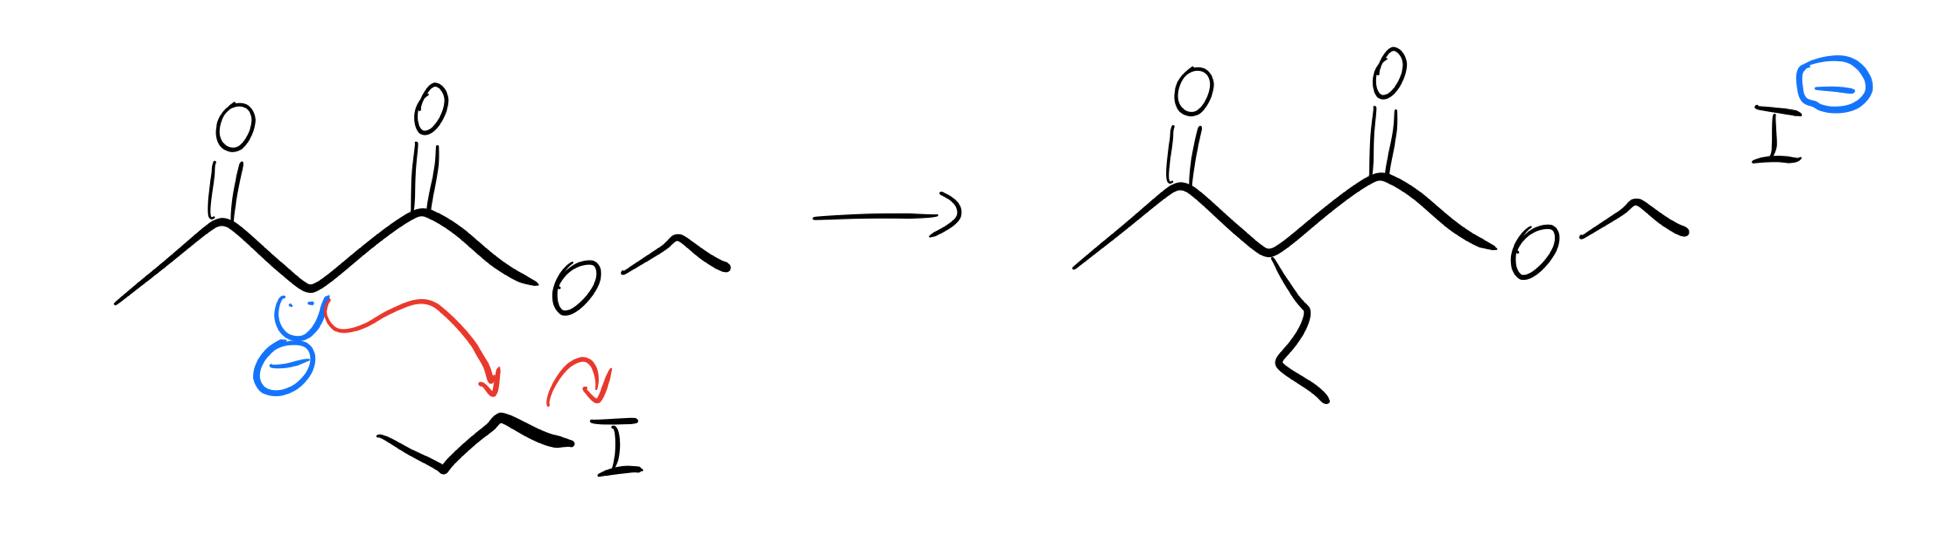 Enolate-alkylation